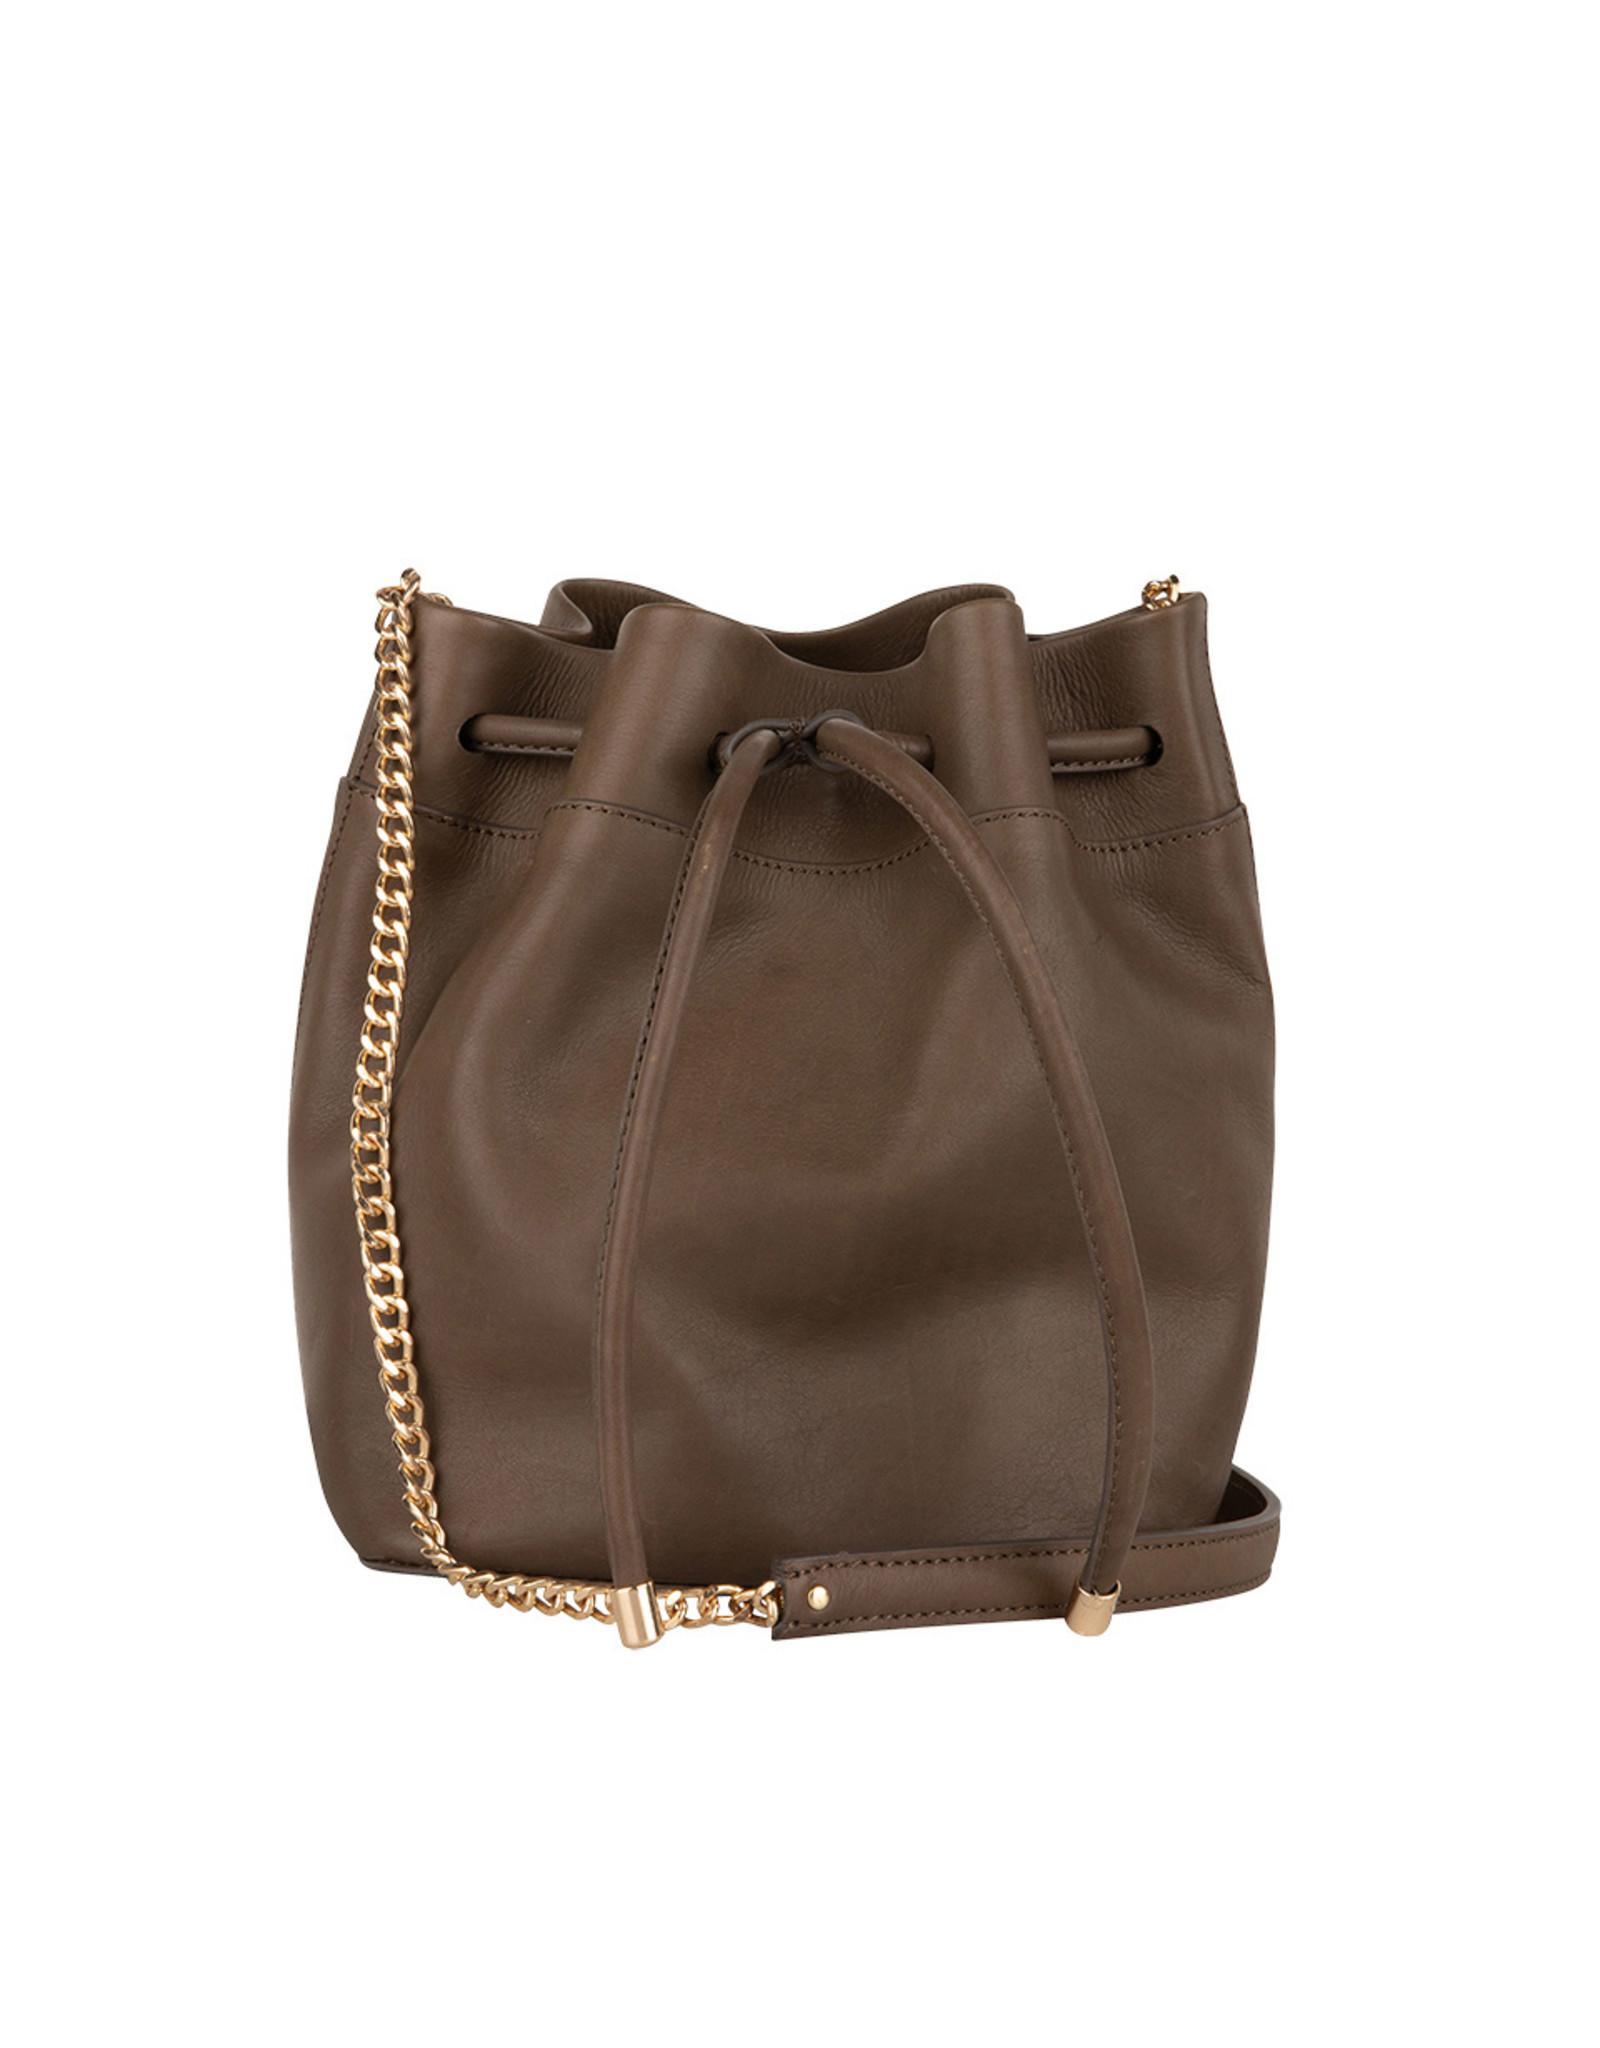 Dante6 Karlie leather bucket bag Smokey Olive